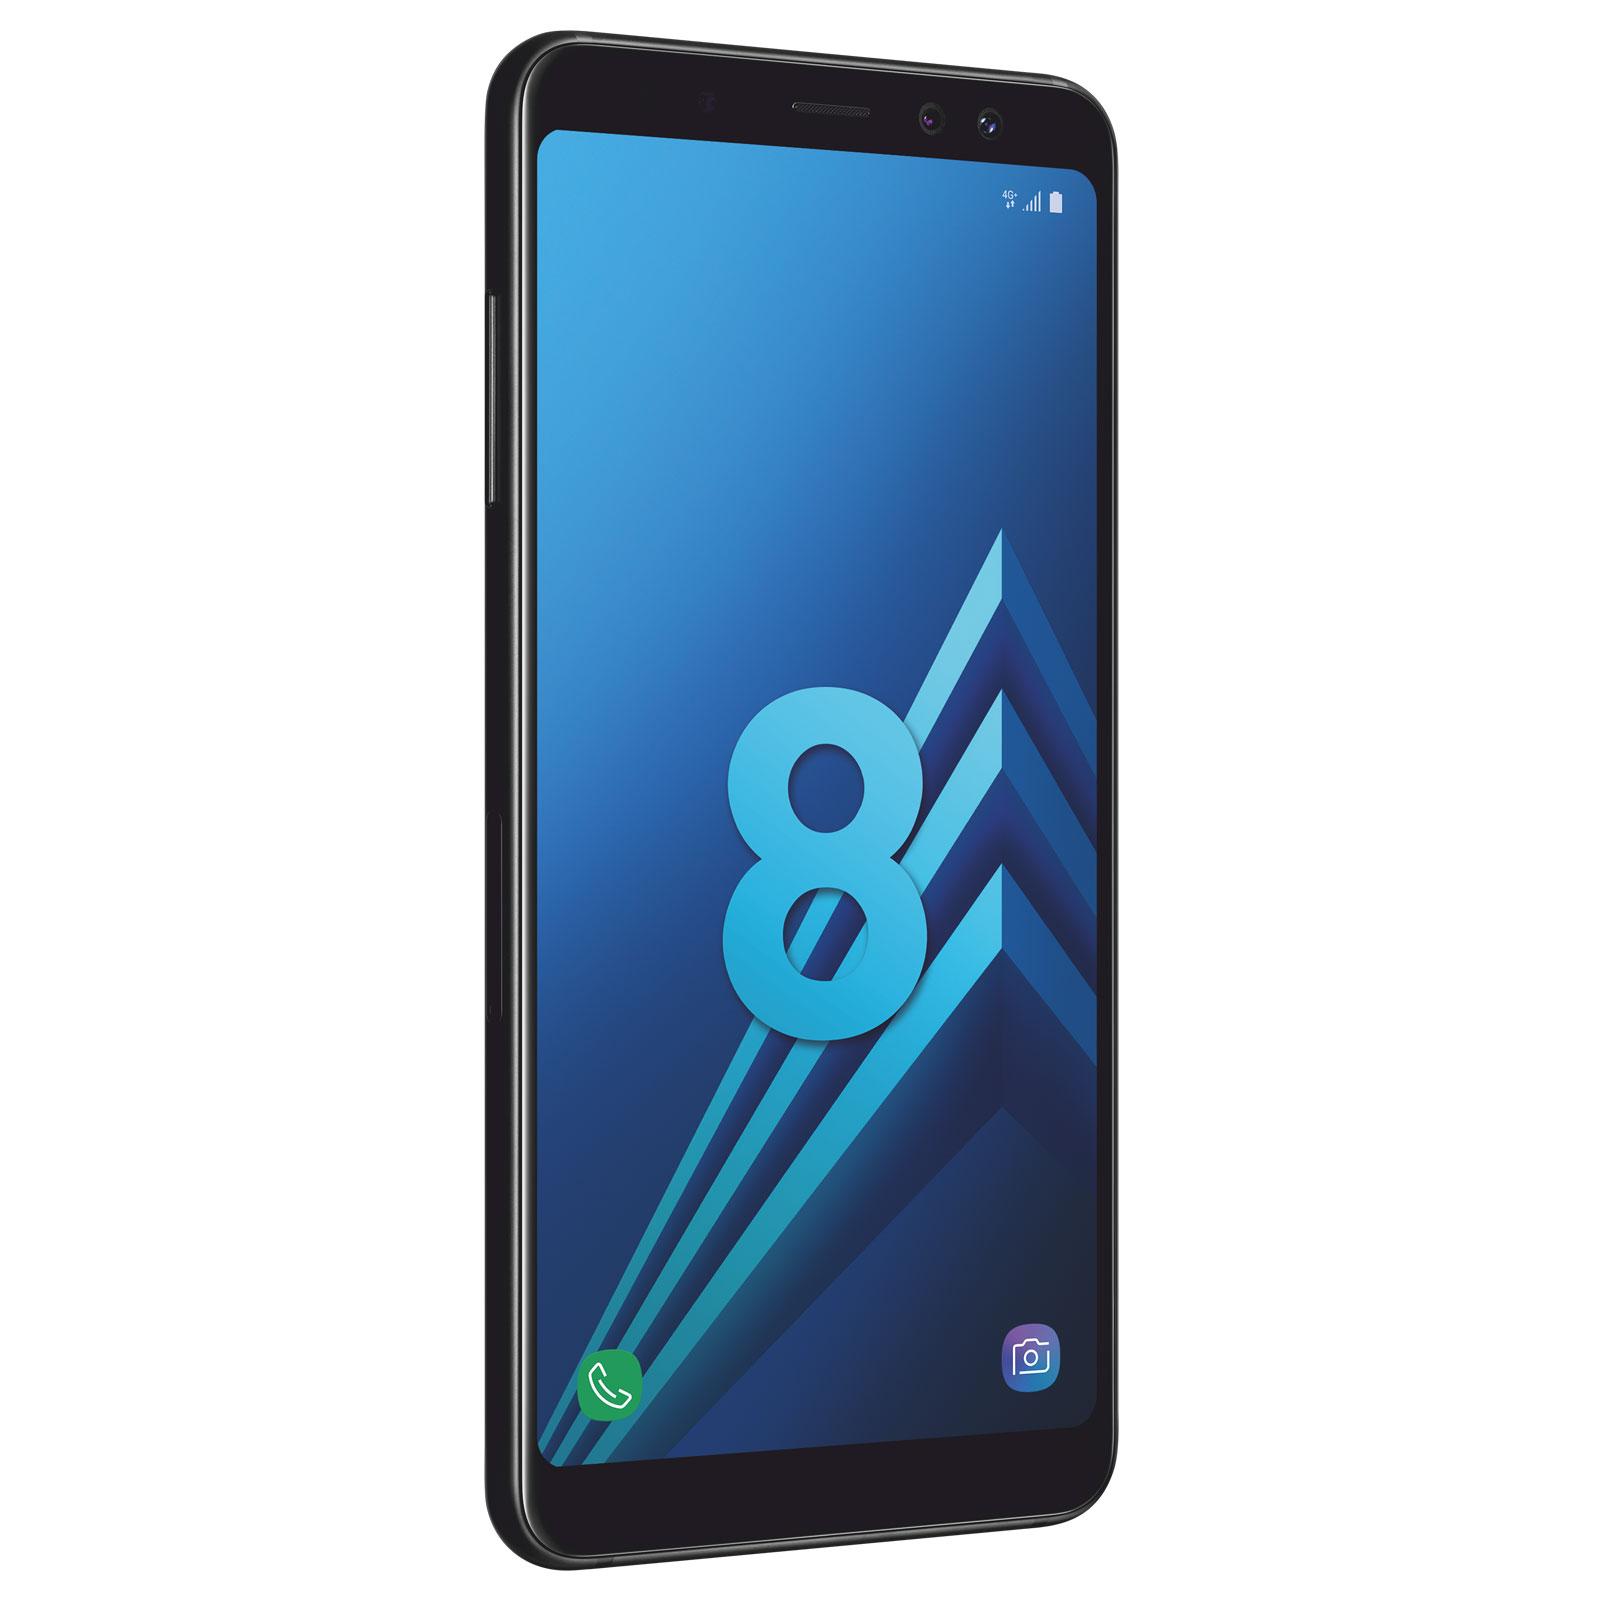 Samsung Galaxy A8 A530 32Go Noir Dual Sim (SM-A530FZKDXEF) - Achat / Vente Téléphonie sur Cybertek.fr - 4